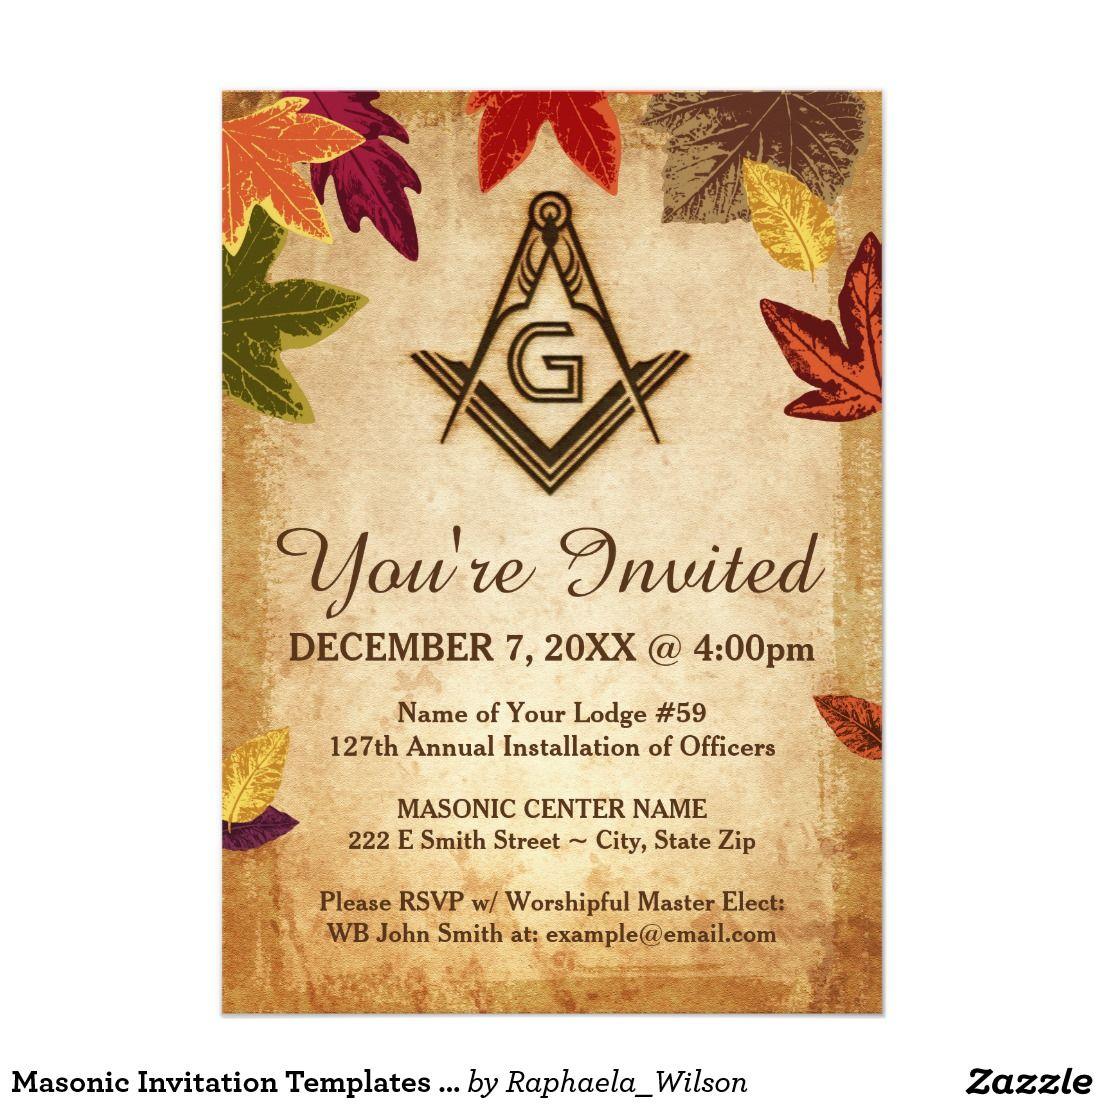 Masonic Invitation Templates | Autumn Leaves | Custom Masonic Gifts ...